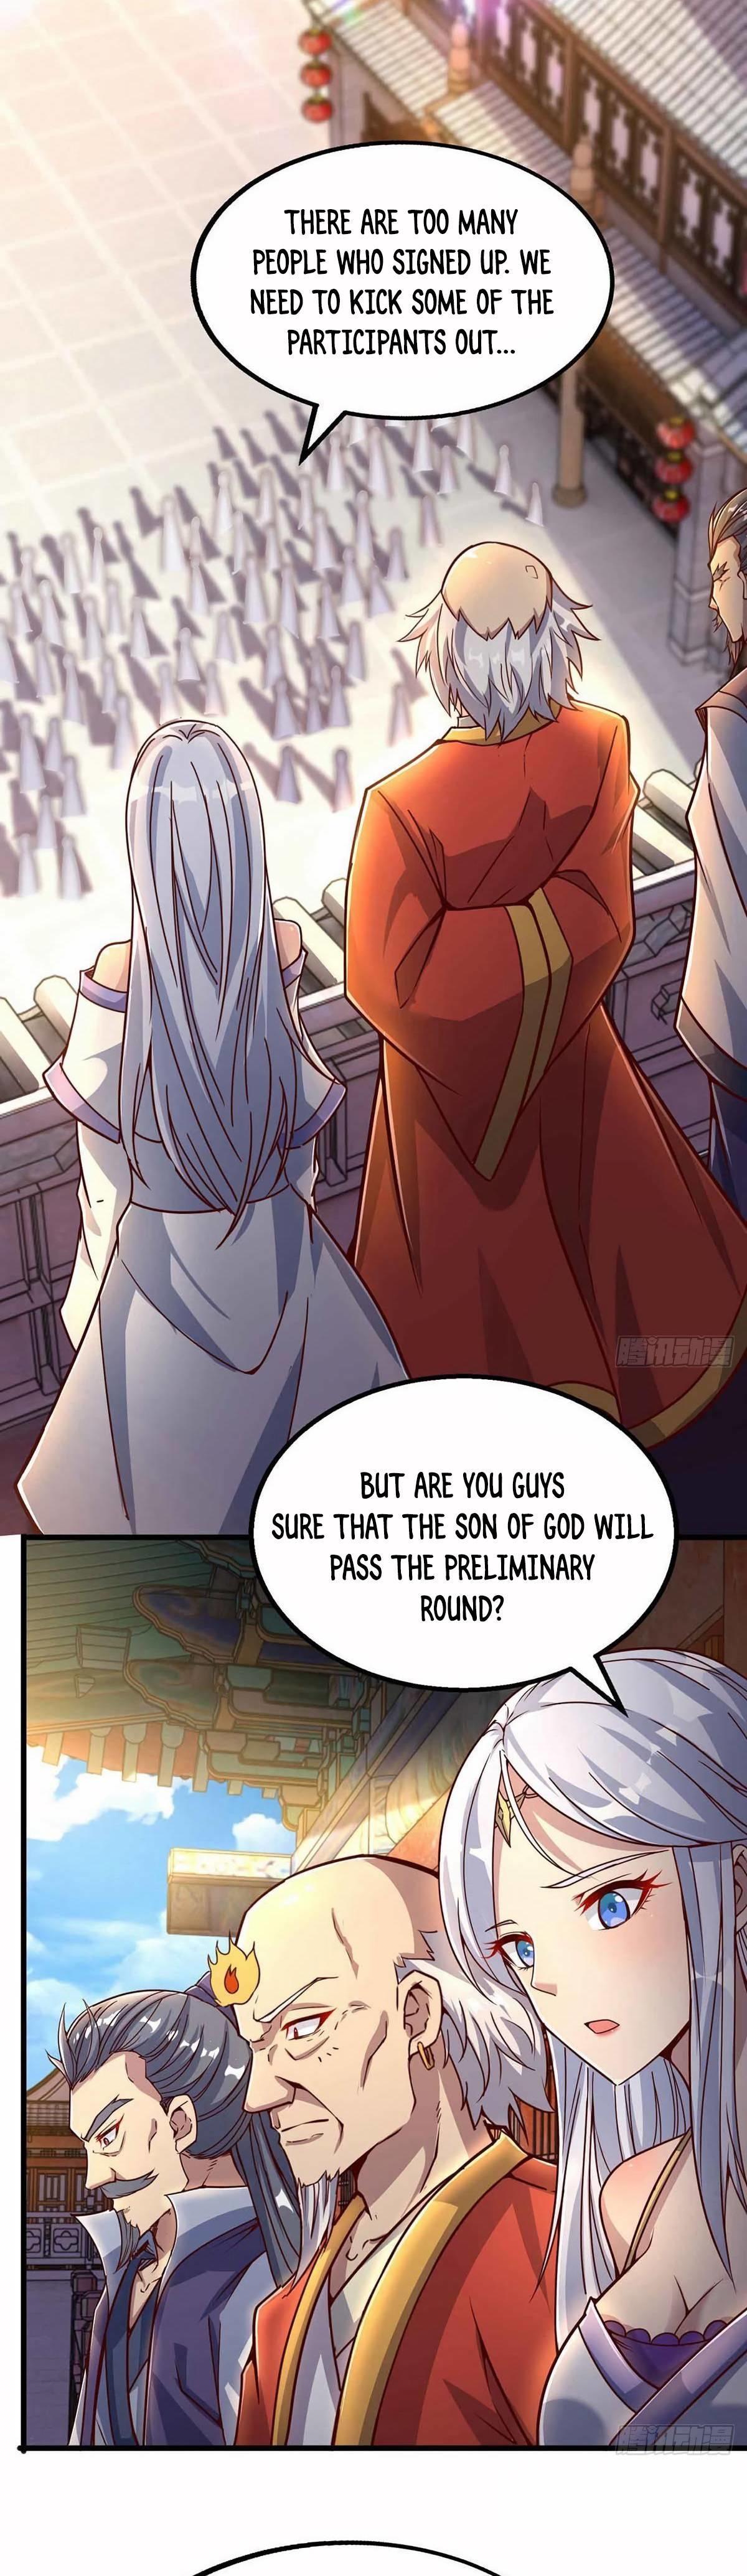 I Was Sealed 900 Million Times Chapter 28 page 23 - Mangakakalots.com